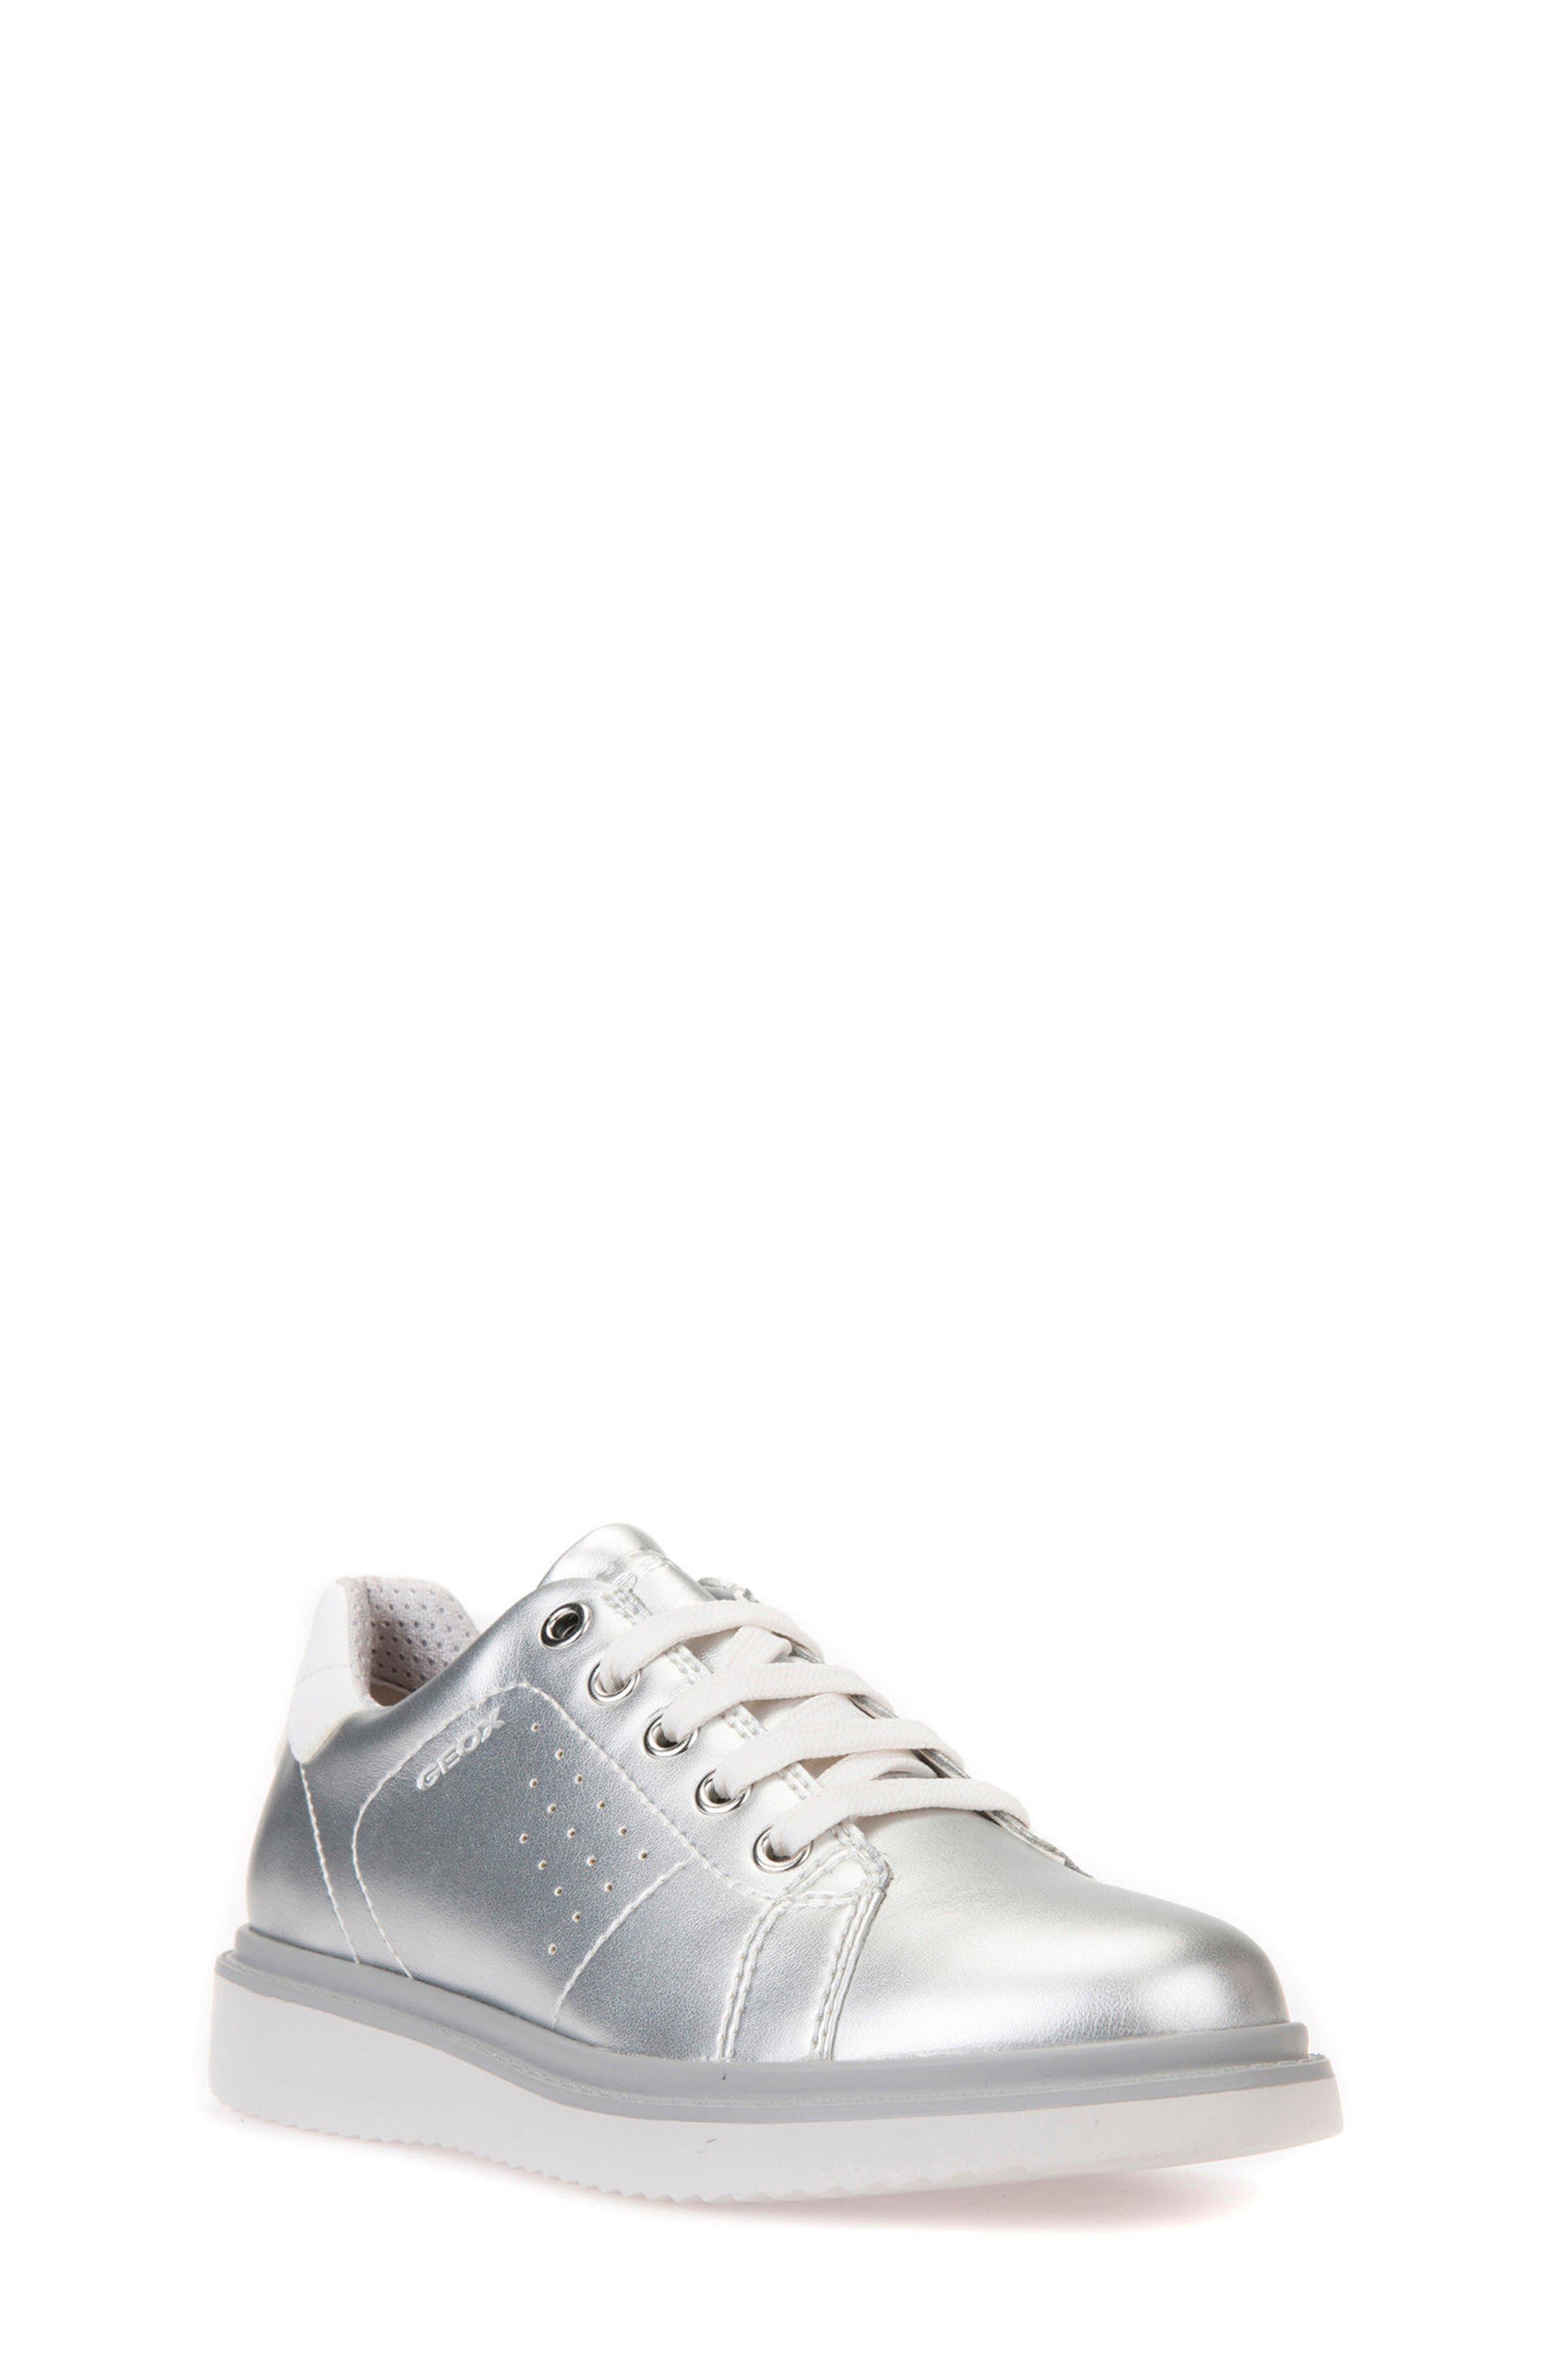 Thymar Low Top Sneaker,                         Main,                         color, SILVER